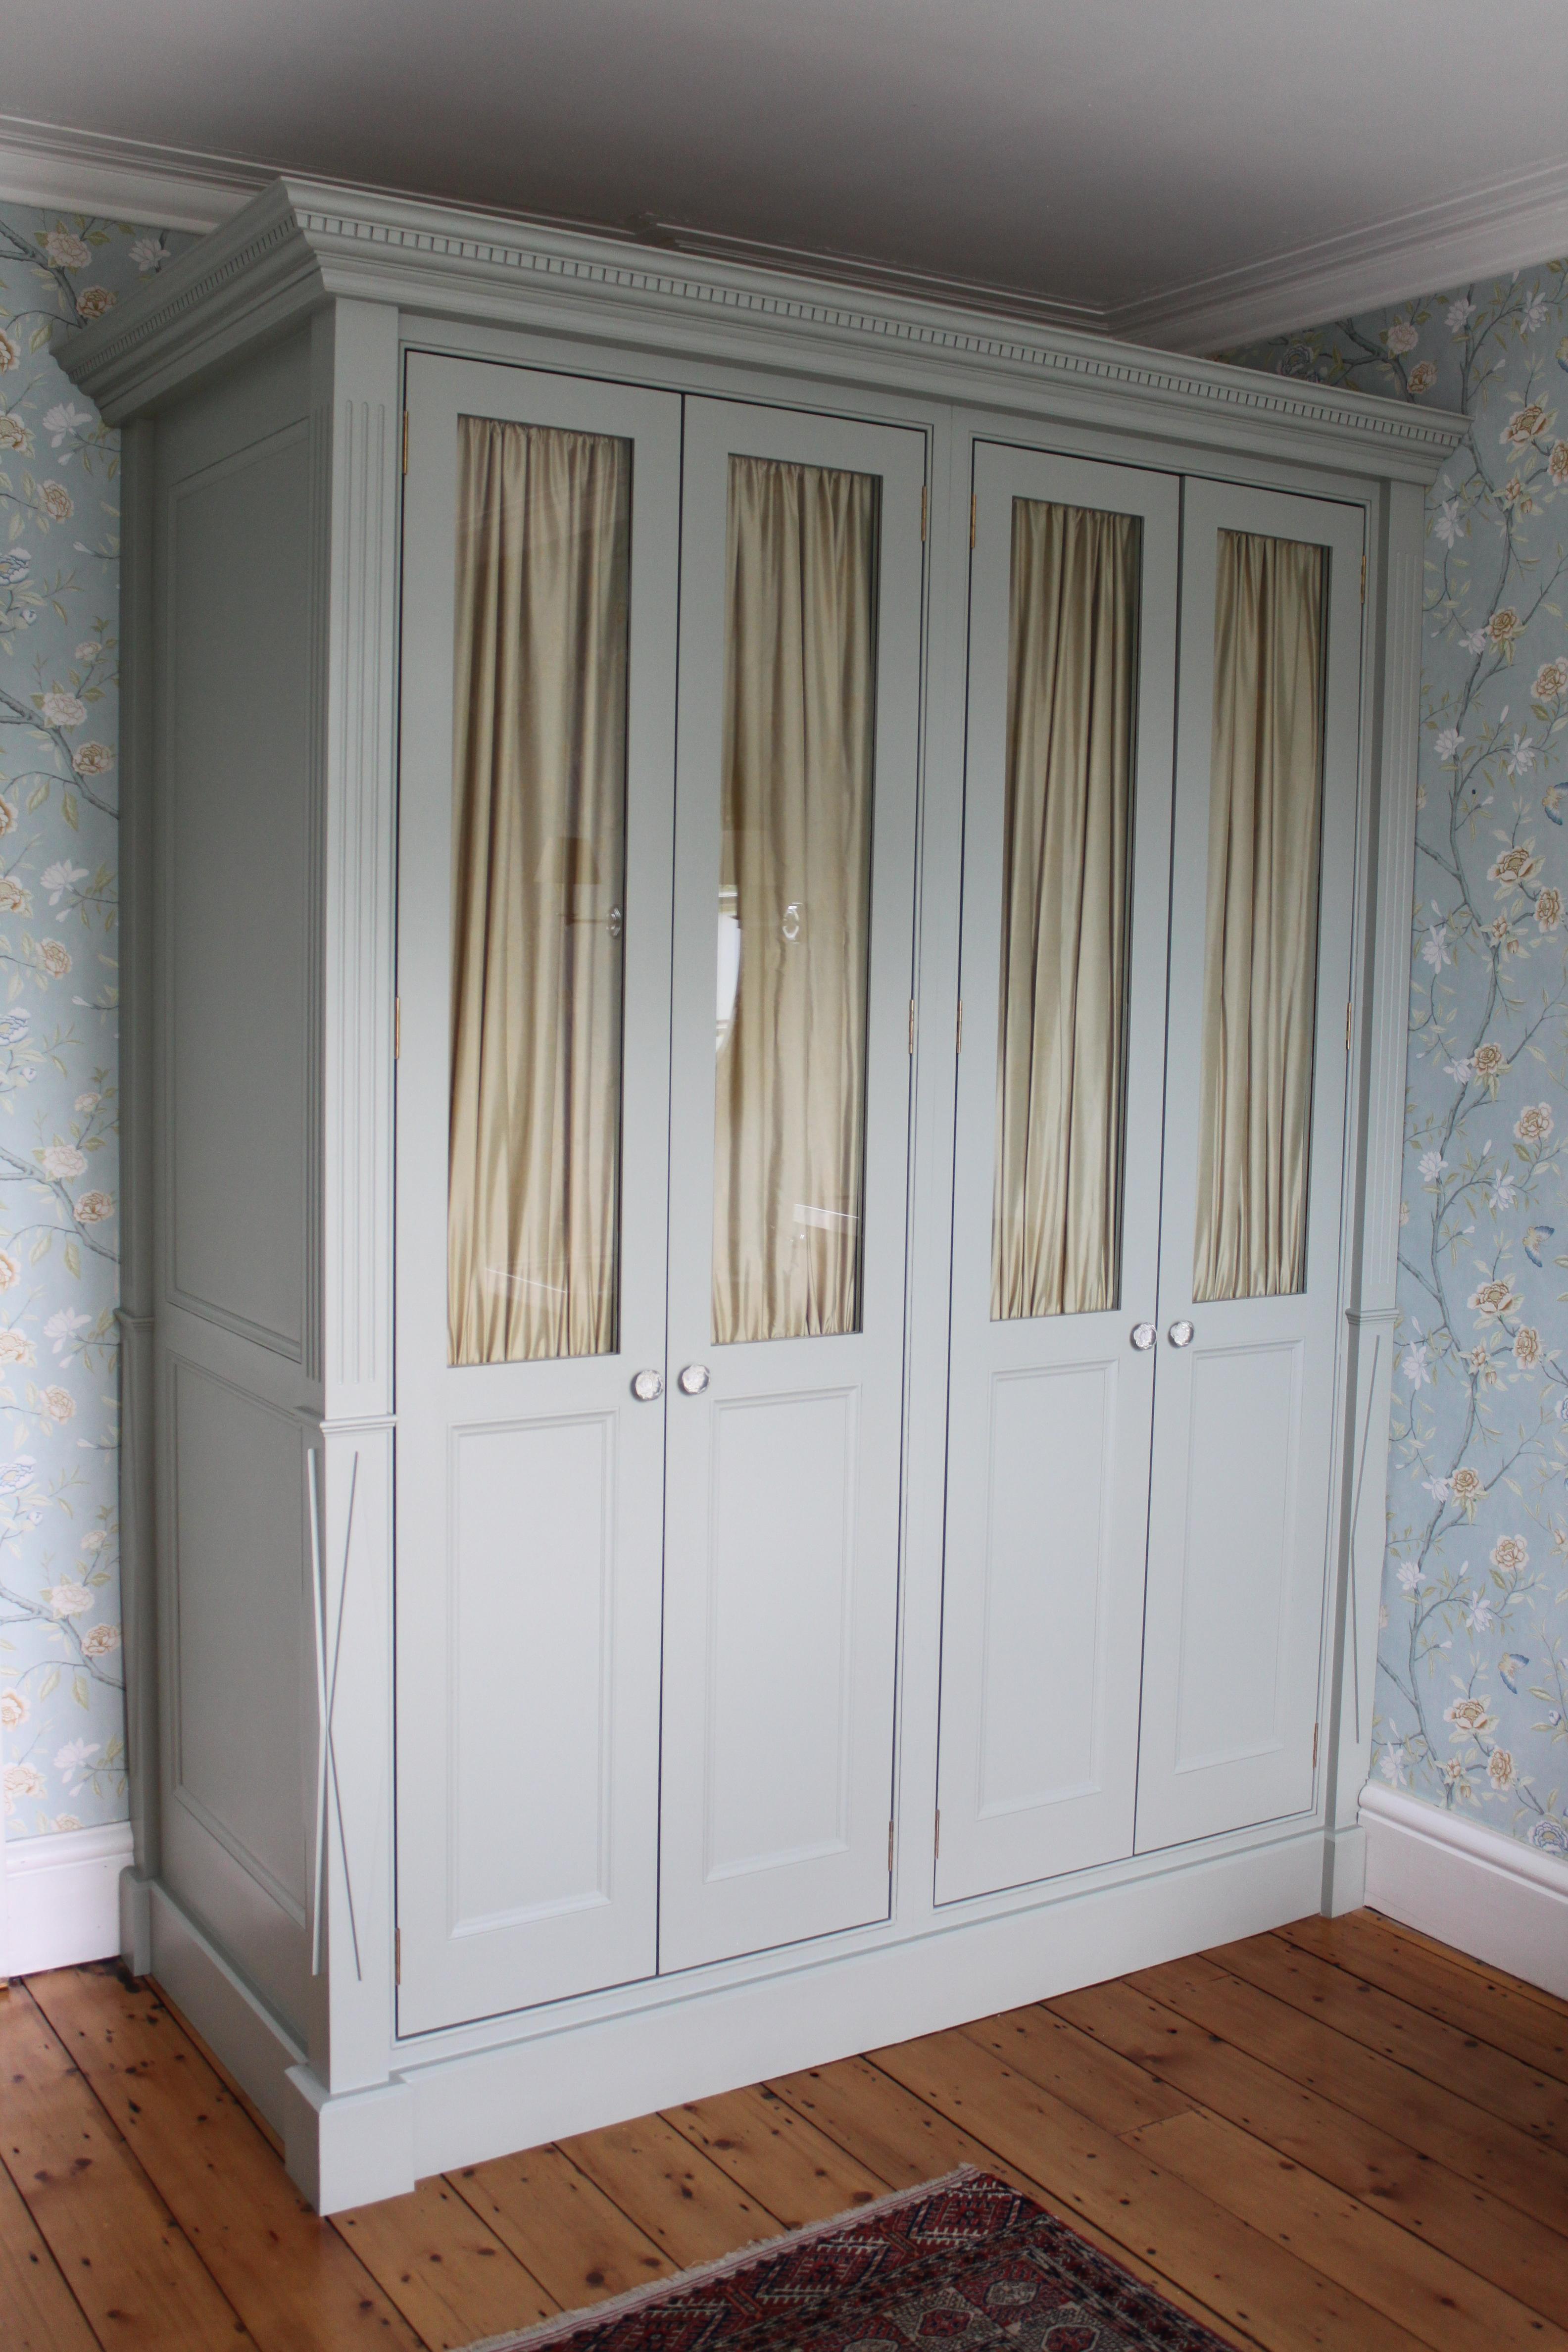 airing cupboard designs photo - 4